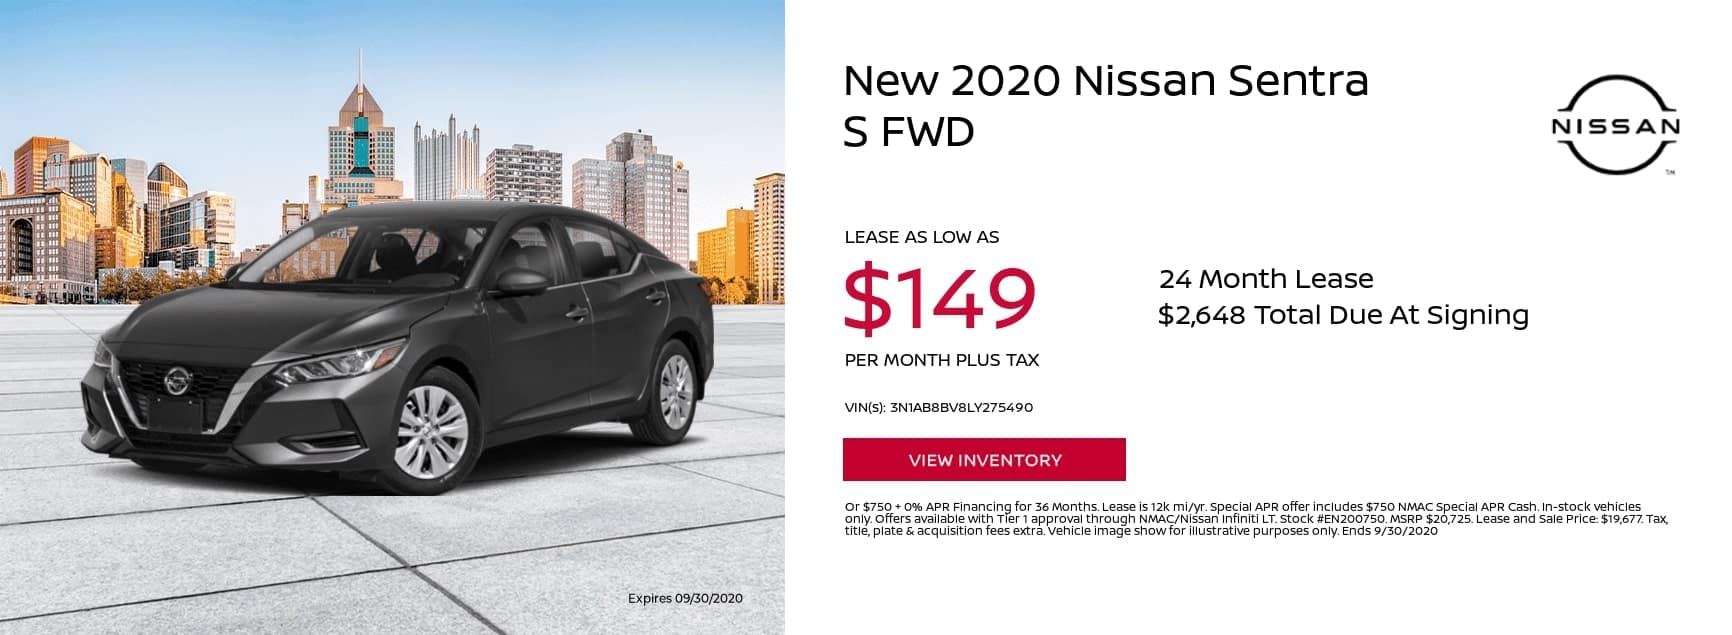 2020-Nissan-Sentra-S-FWD-4